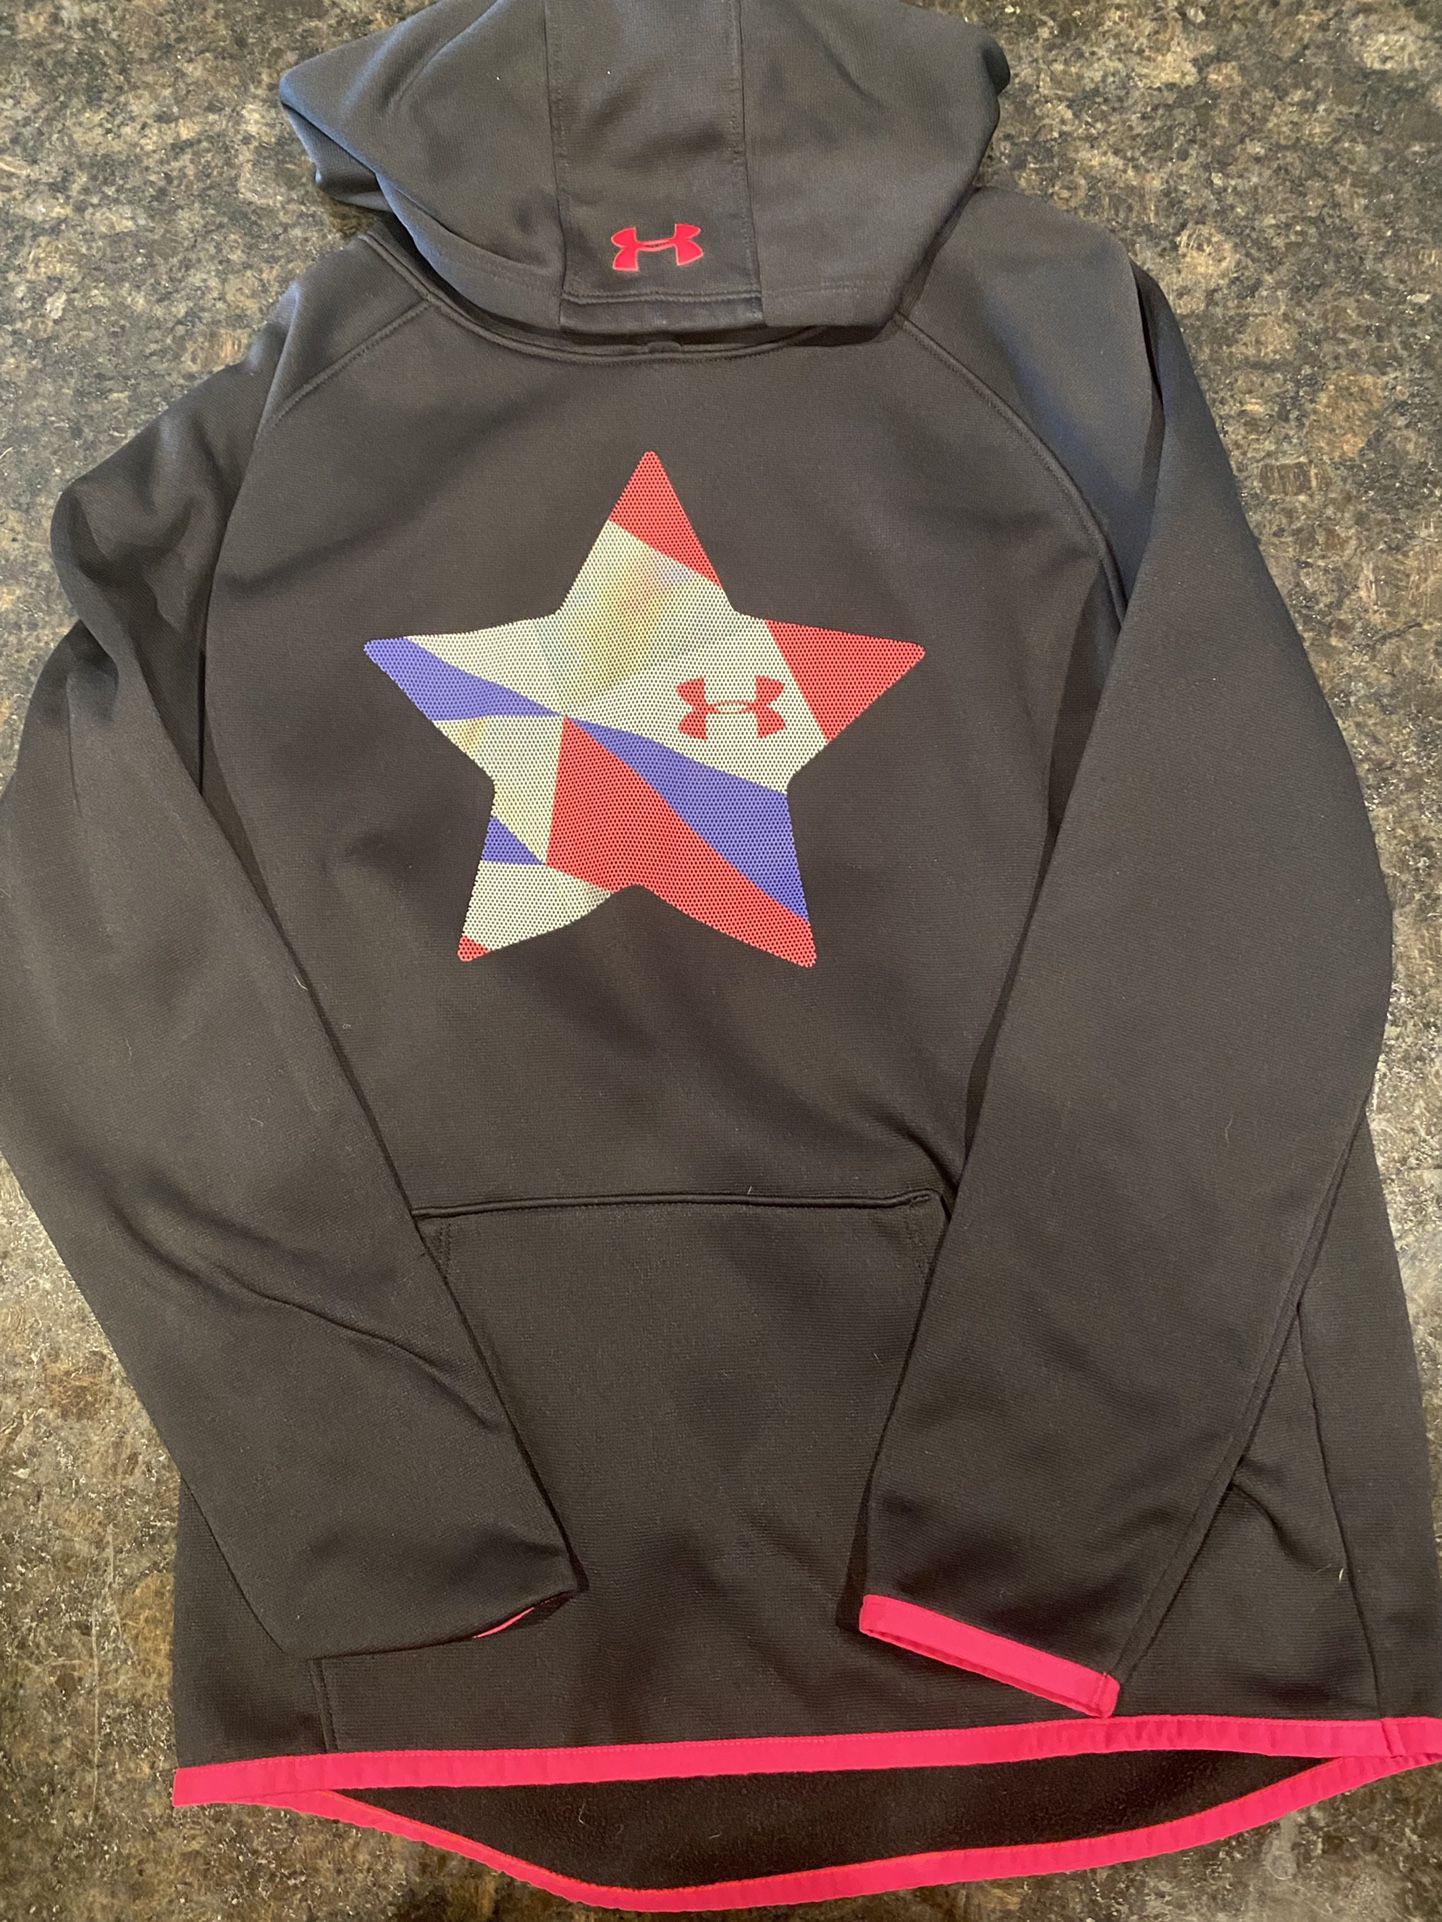 Girls Under Armor Sweatsuit Set. Size Large